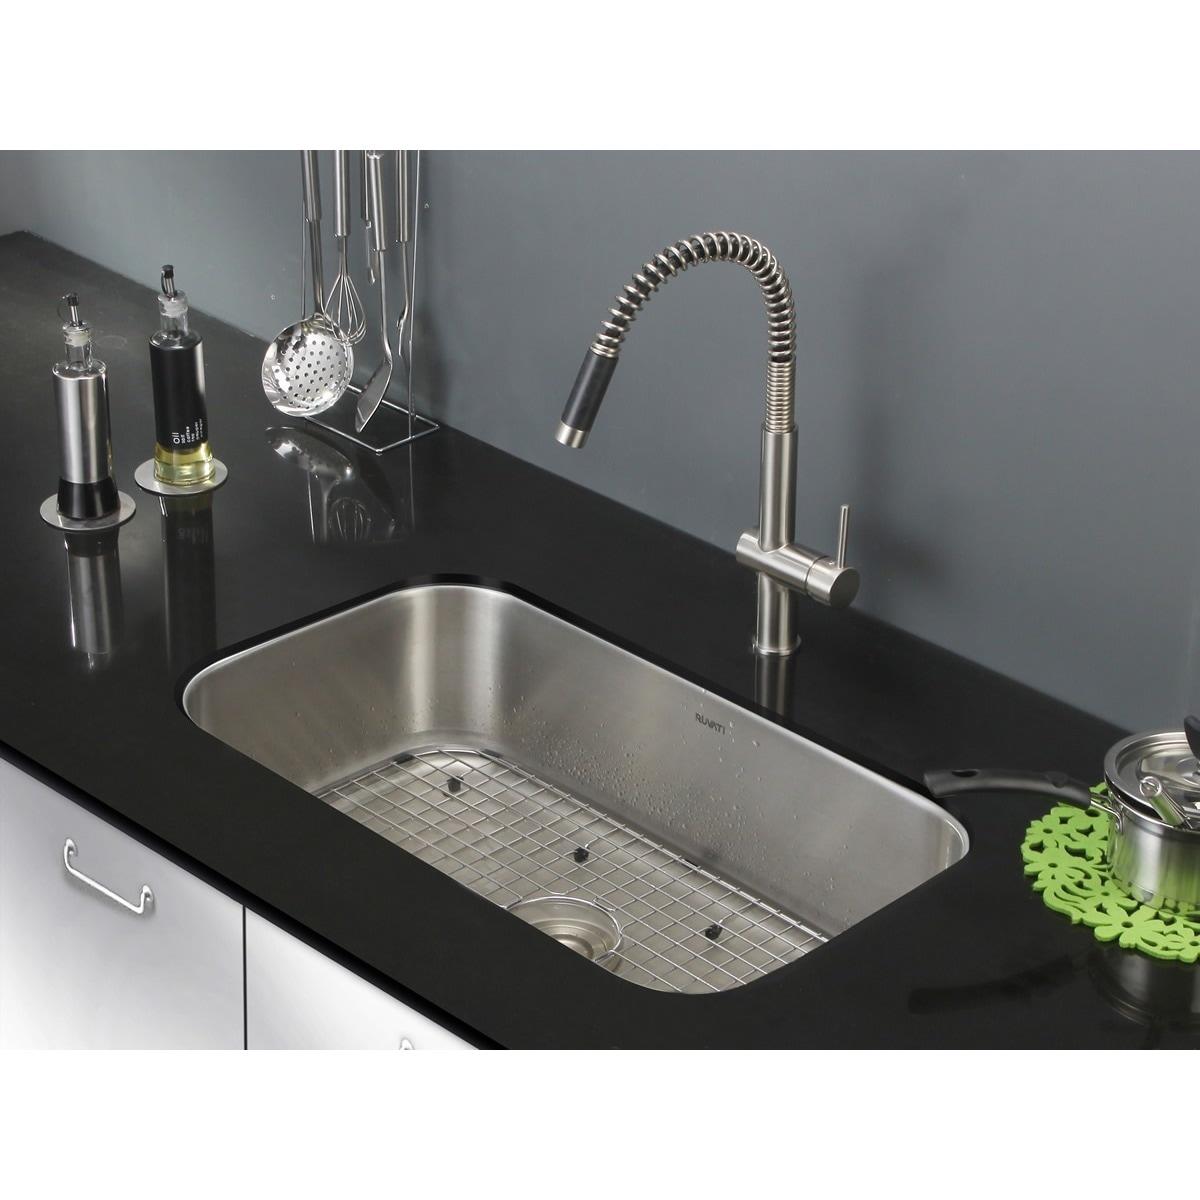 sink reviews undermount kitchen pdp x allmodern gravena ruvati dining